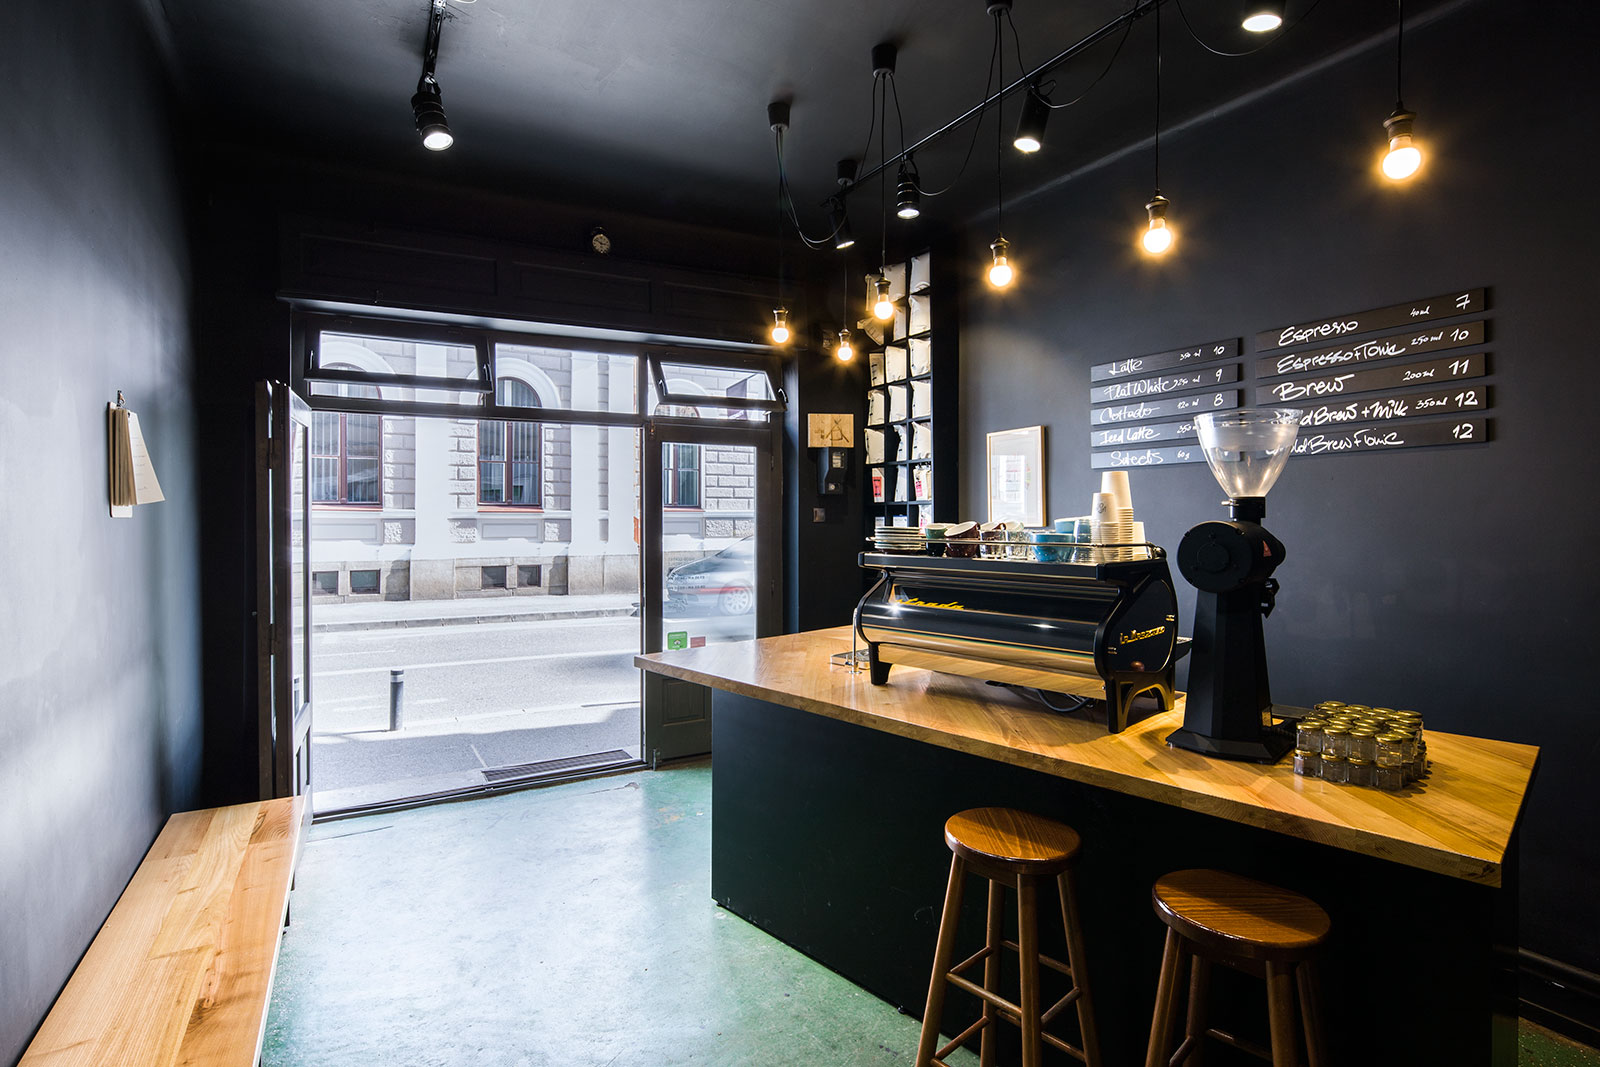 Coffee Shop Interior Atelier Mass Media Photos And Videos 1